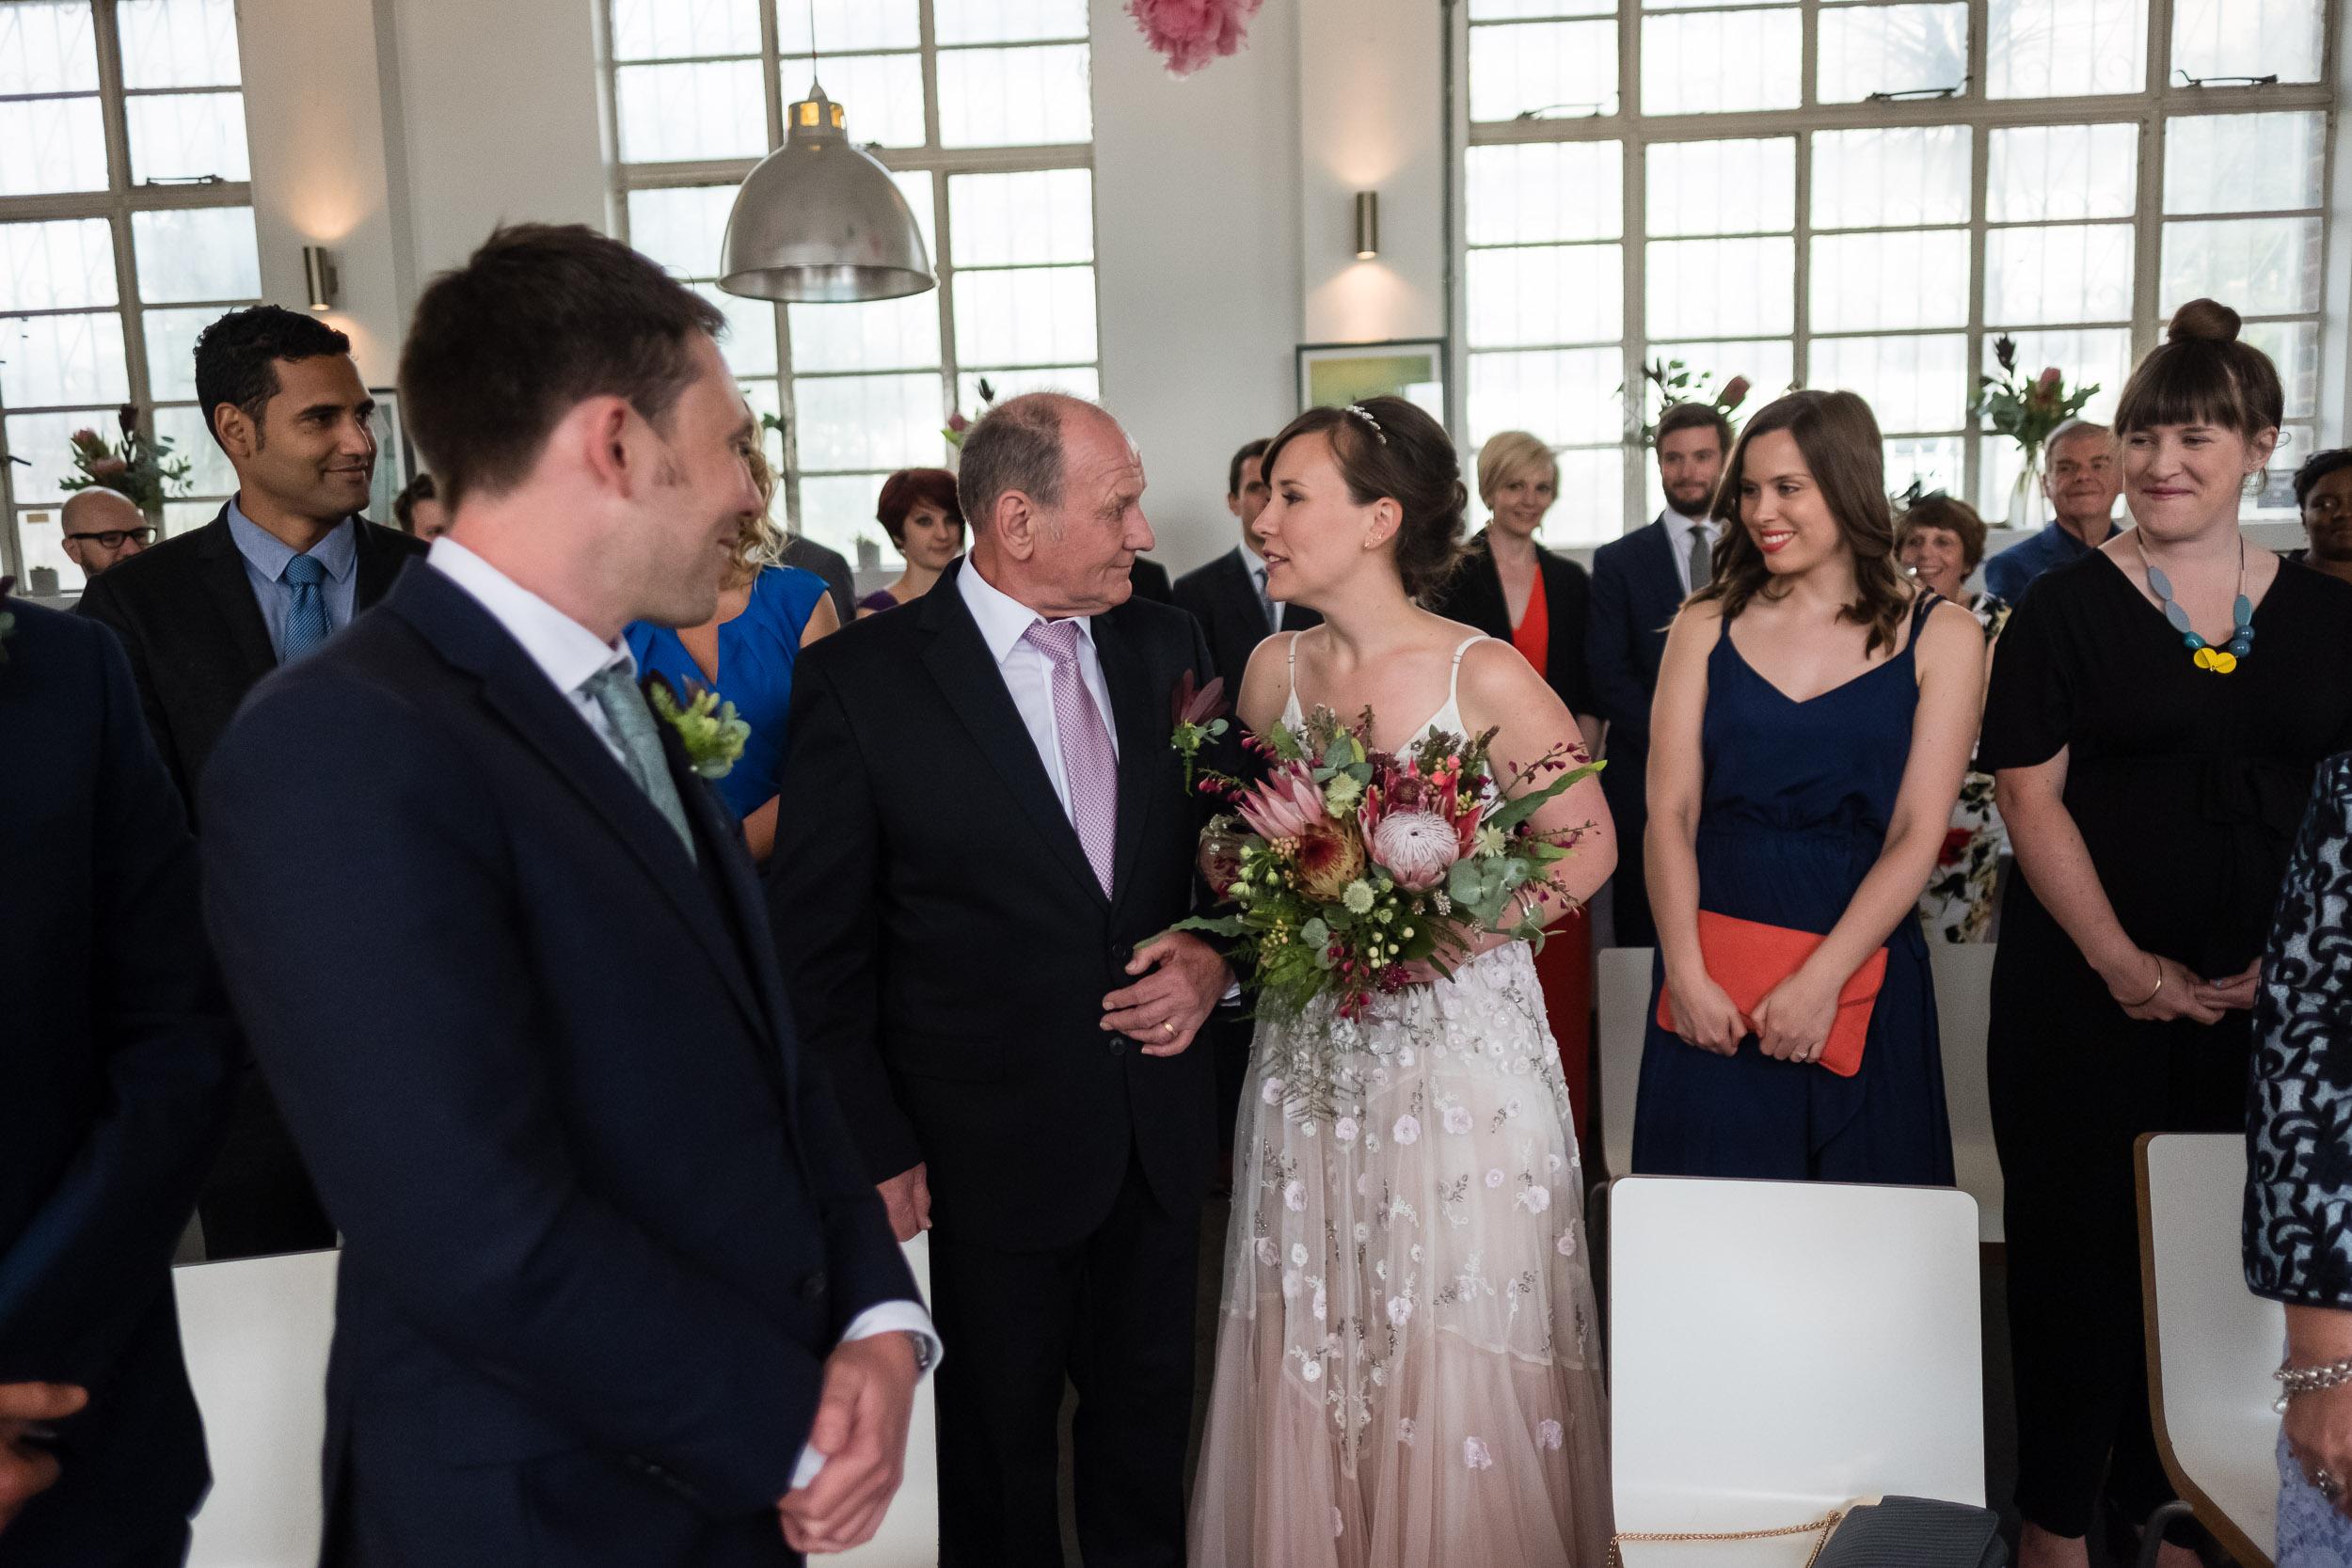 brockwell-lido-brixton-herne-hill-wedding-123.jpg